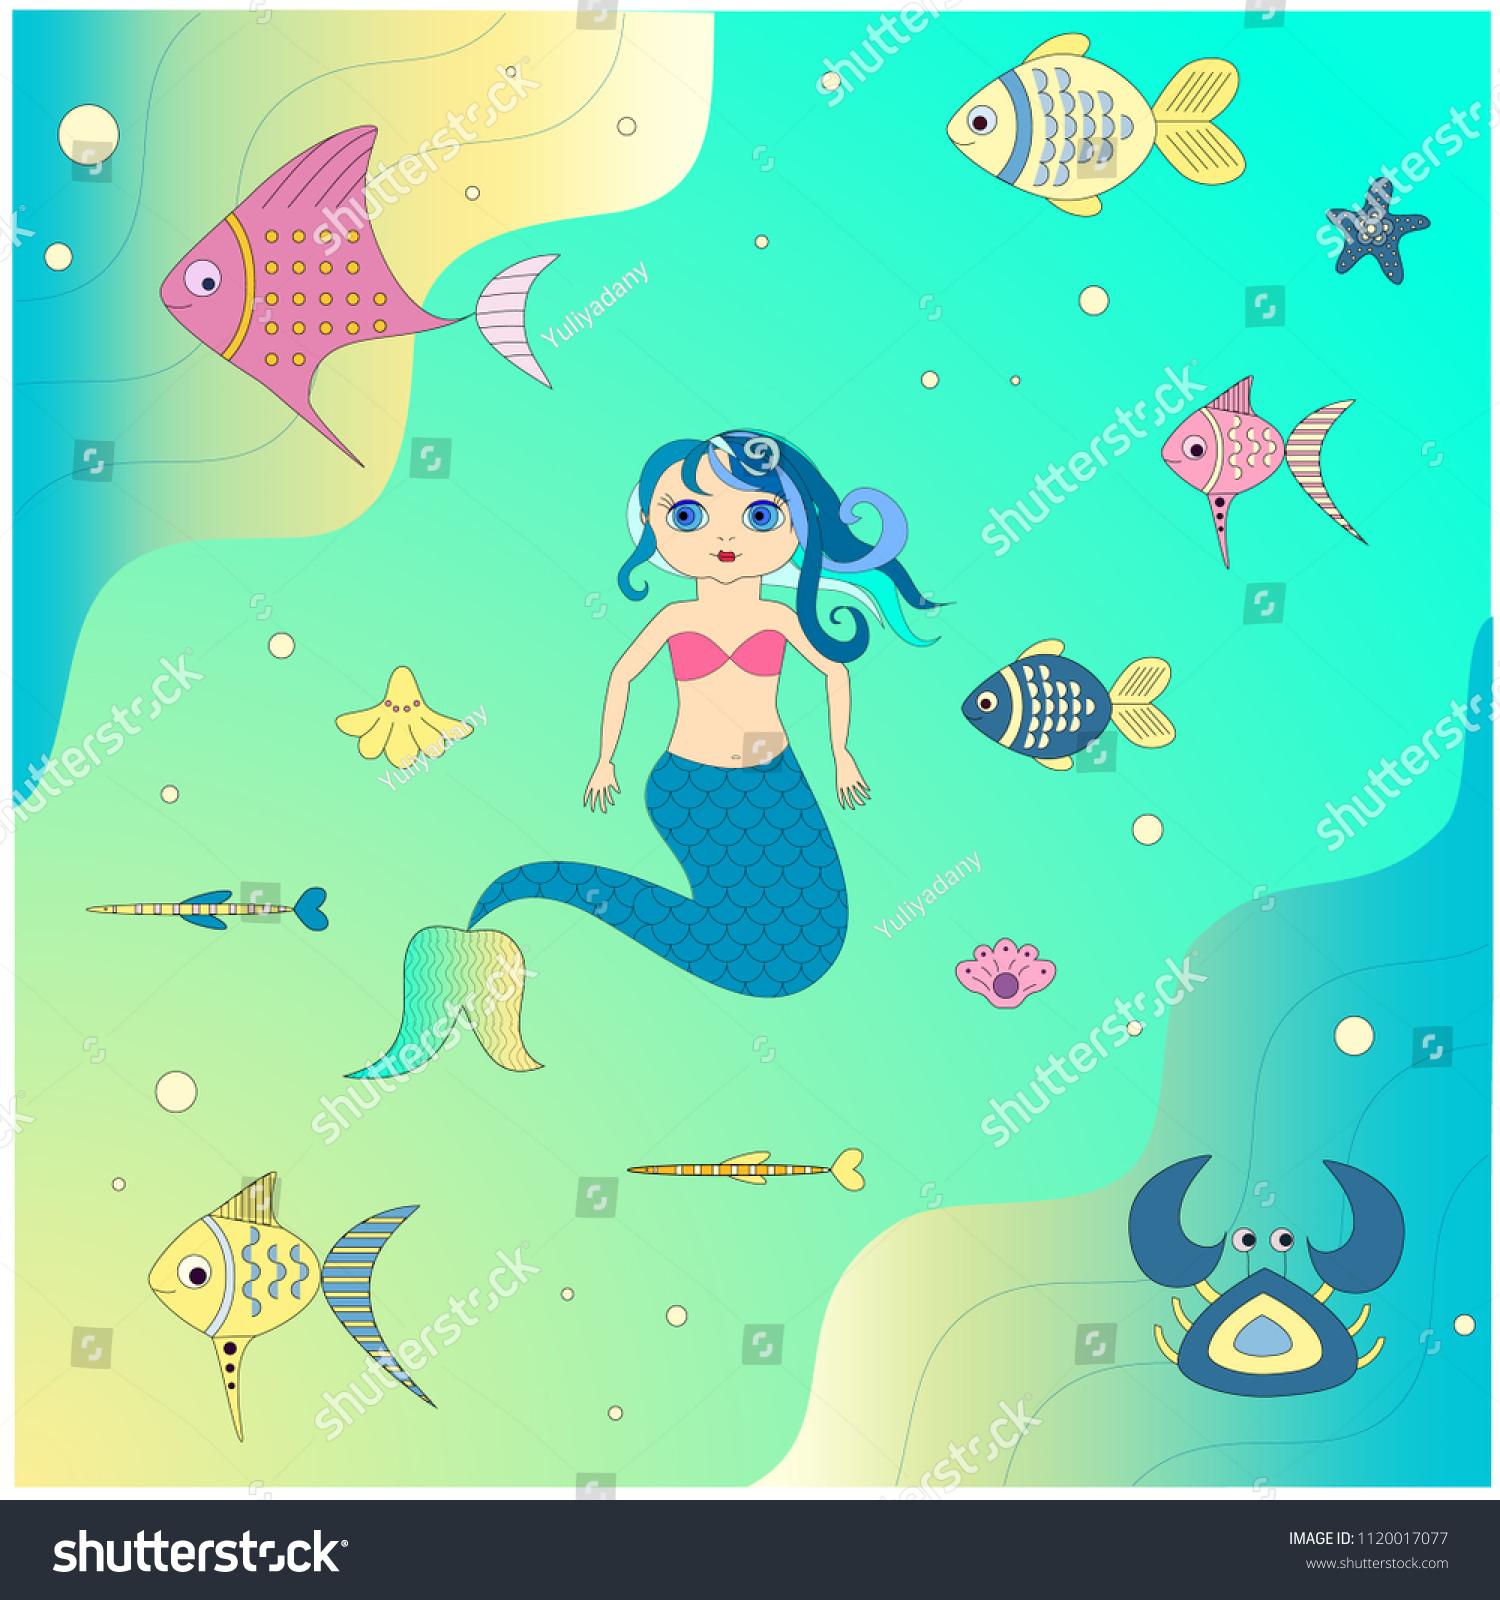 Animated Pictures Of Seashells mermaid underwater world fish crab seashells stock vector